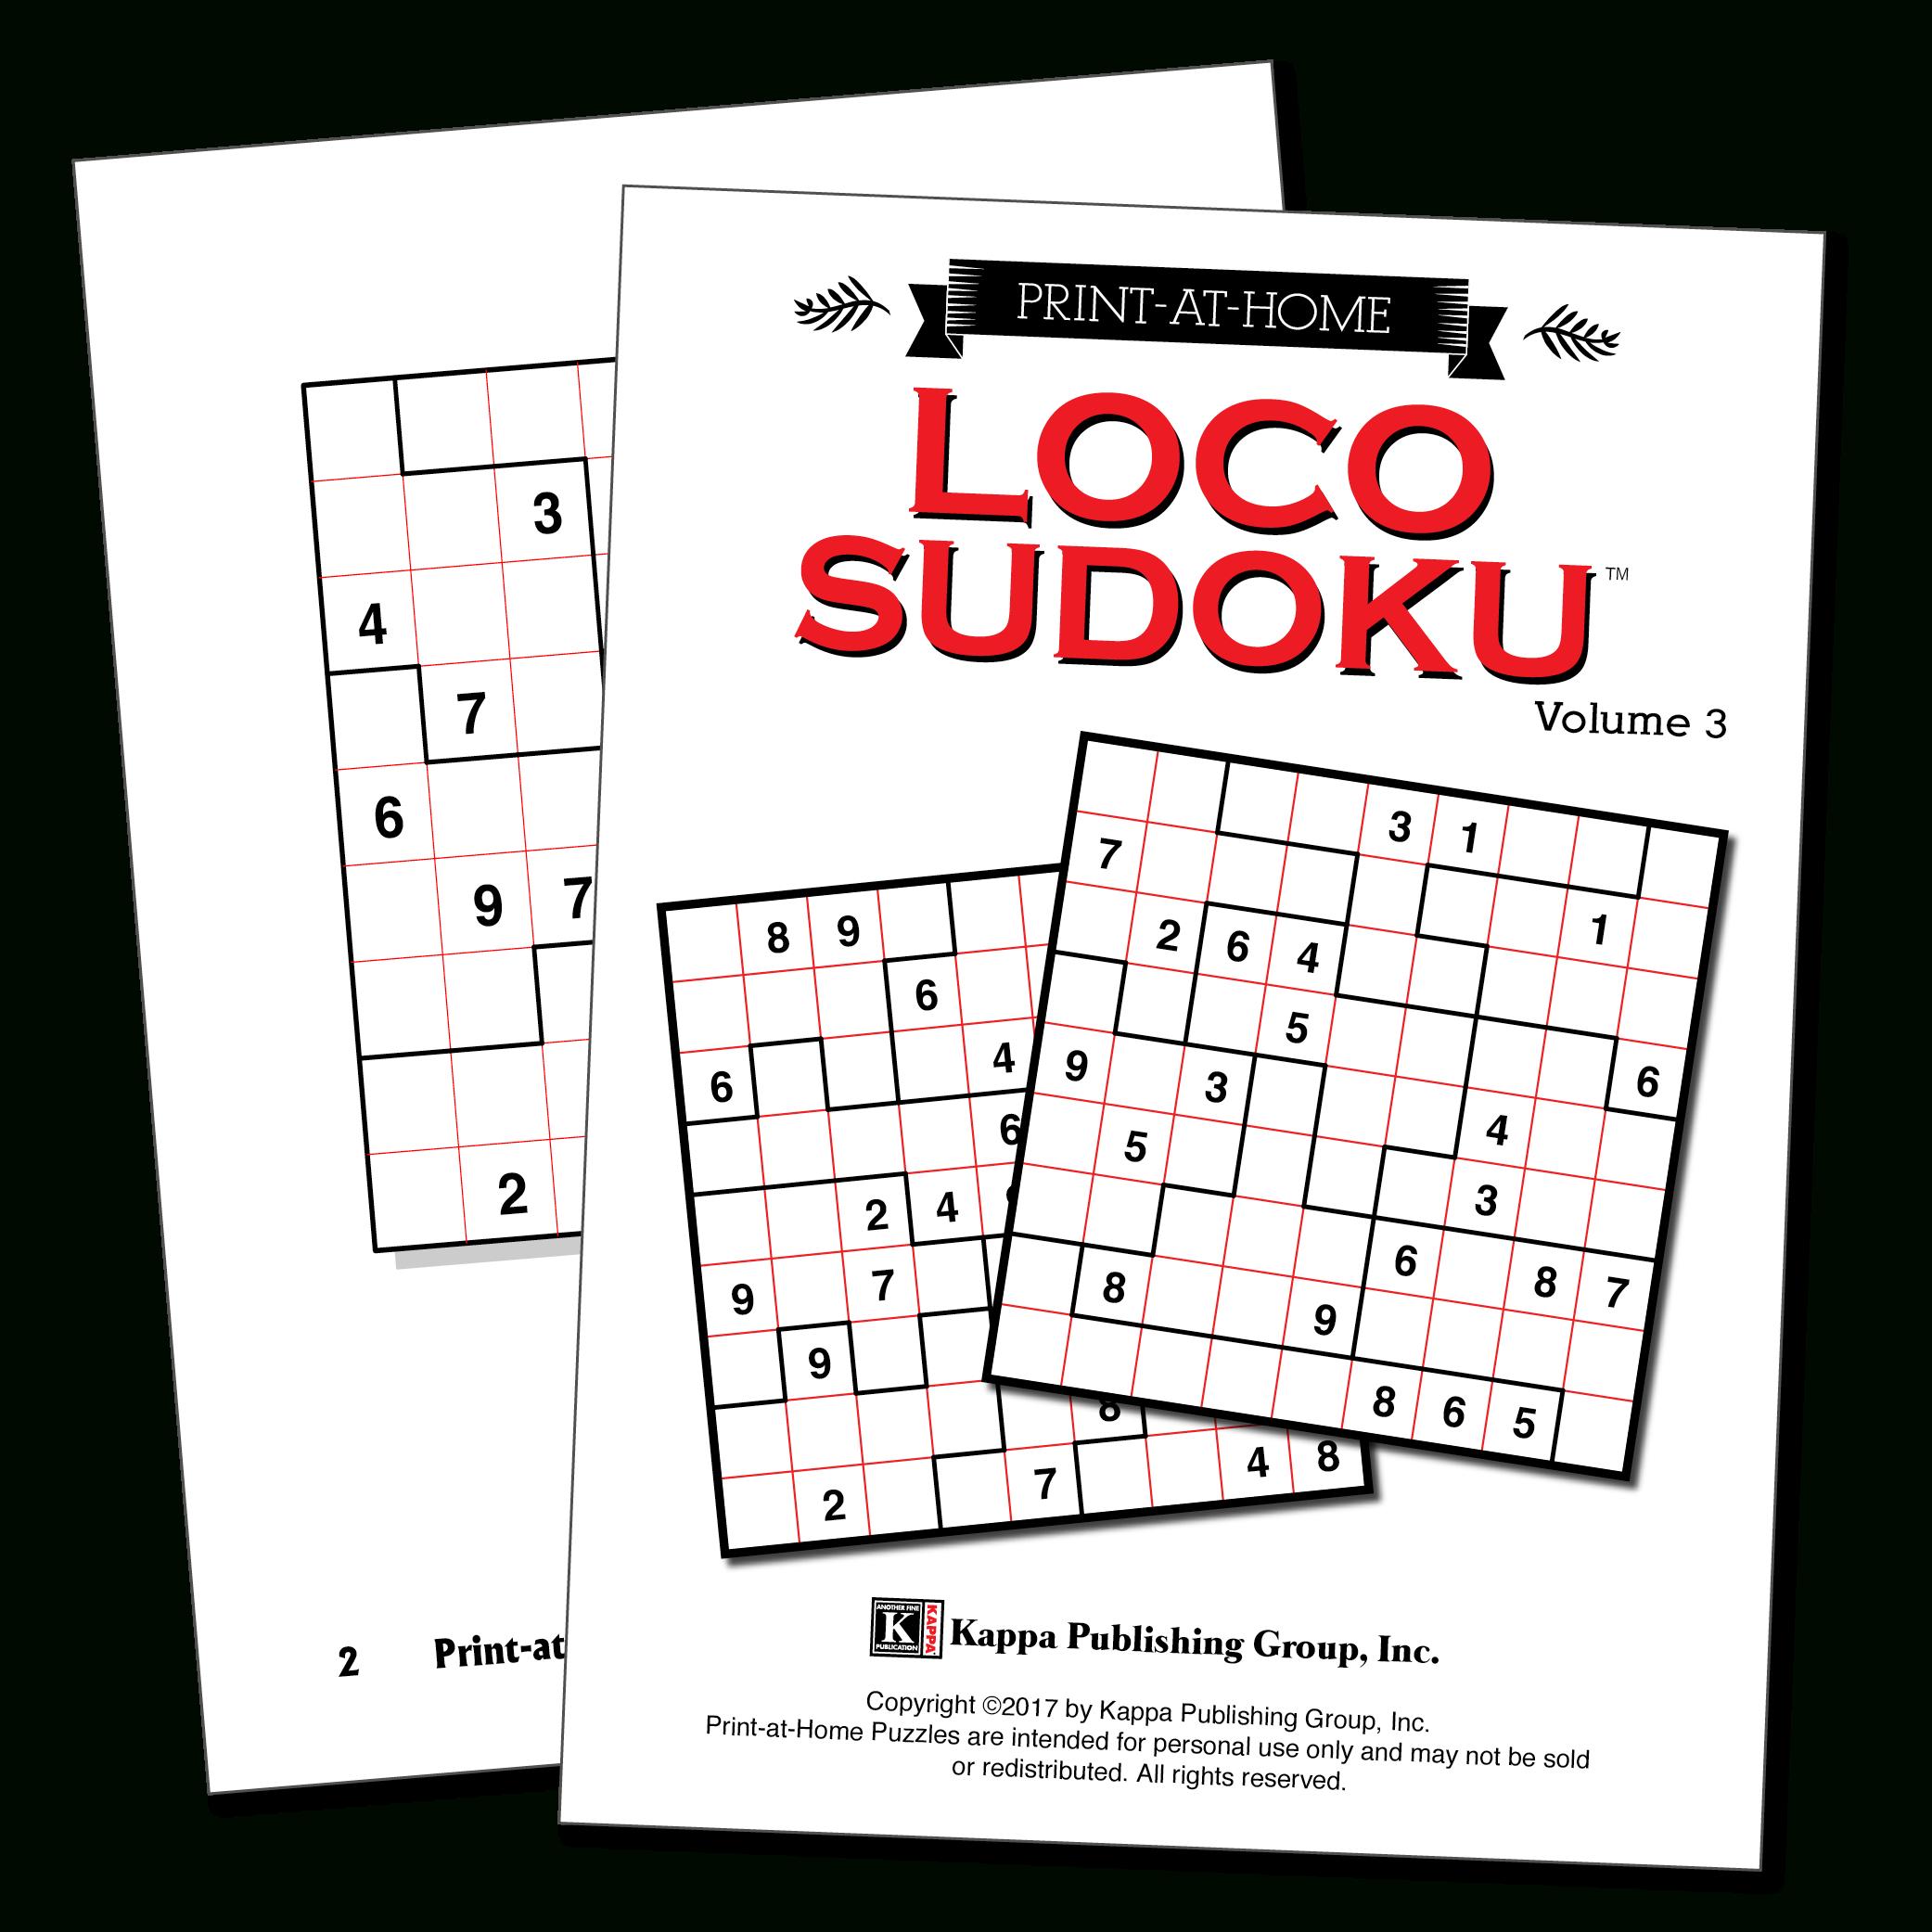 Print-At-Home Loco Sudoku